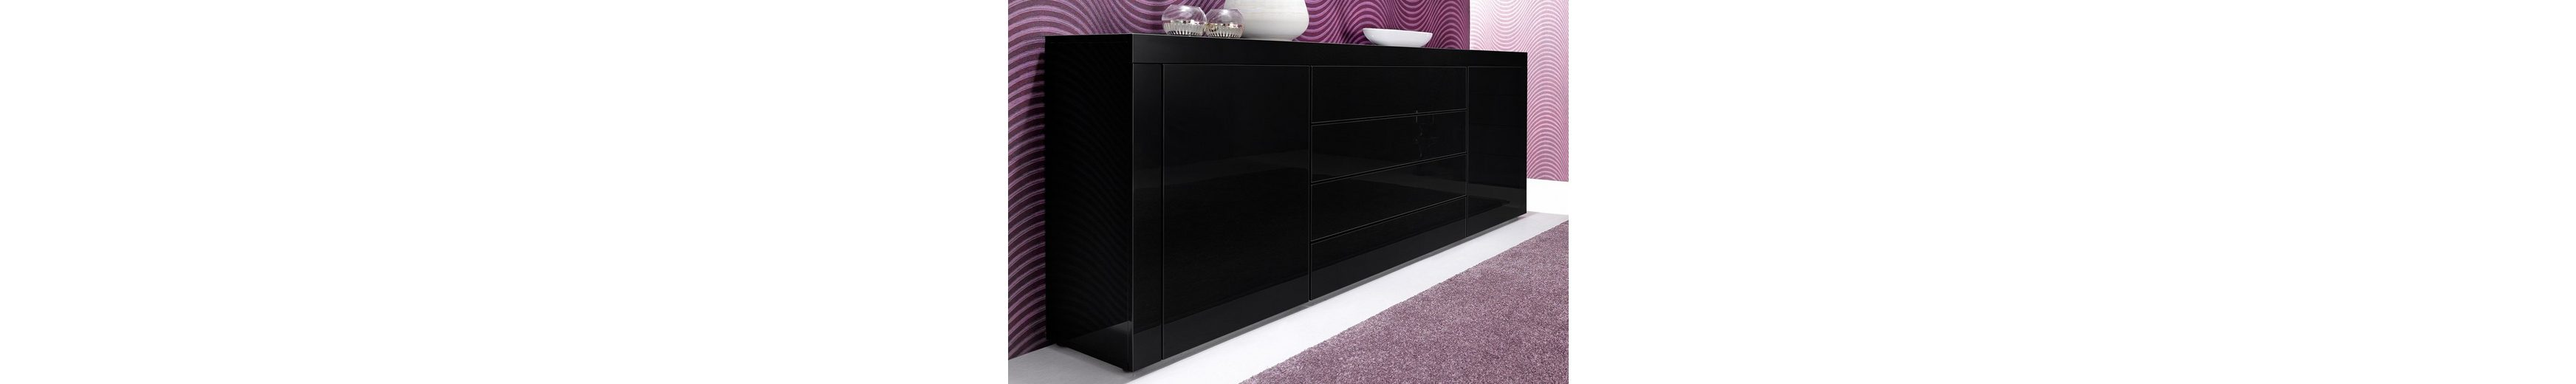 Sideboard, Breite 166 cm